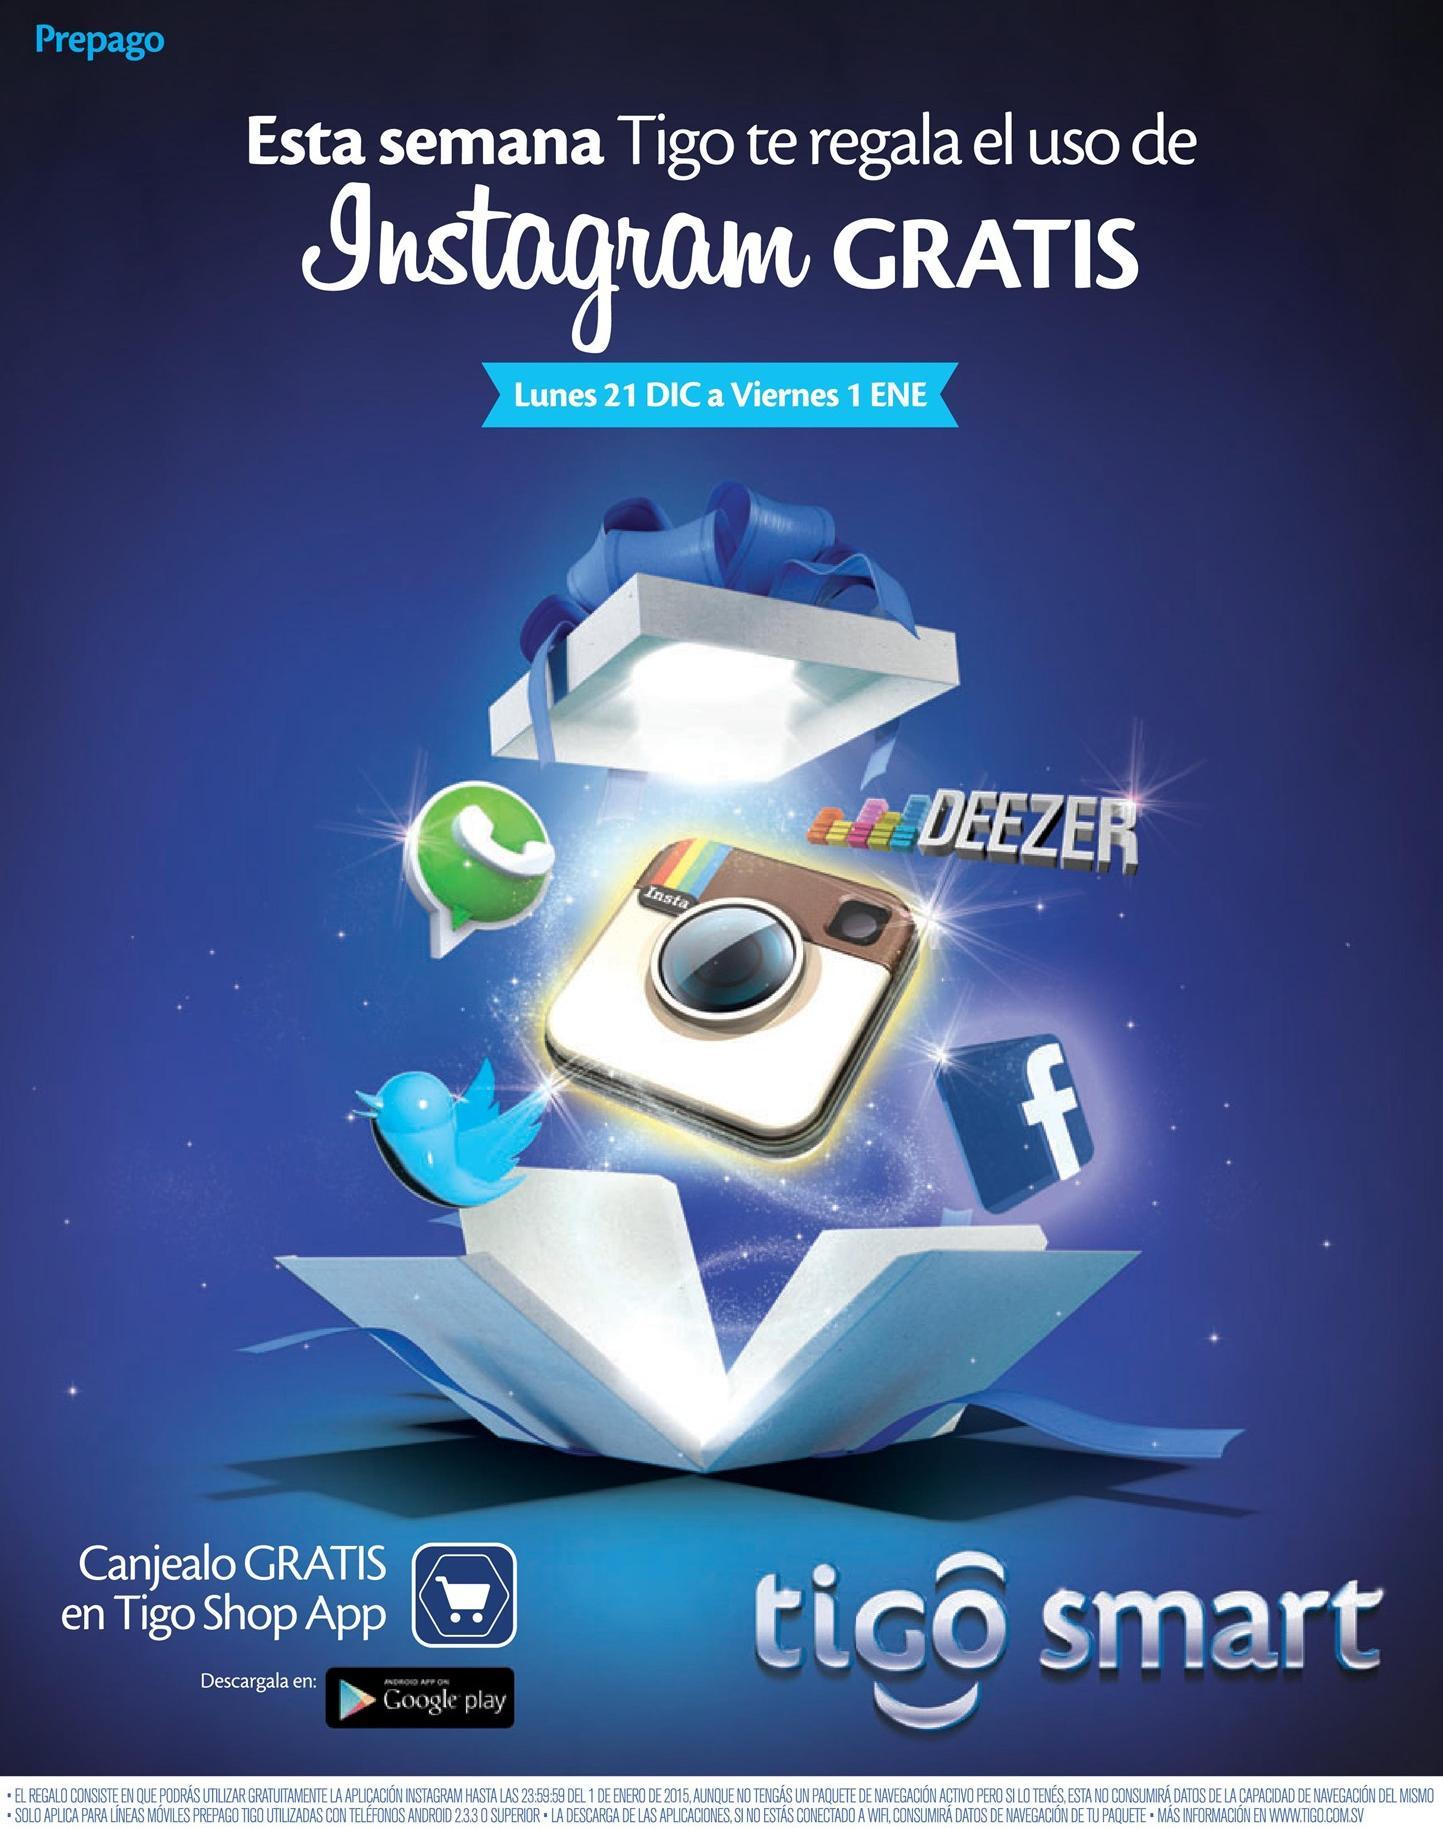 regalos TIGO navidad 2015 SEMANA instagram gratis